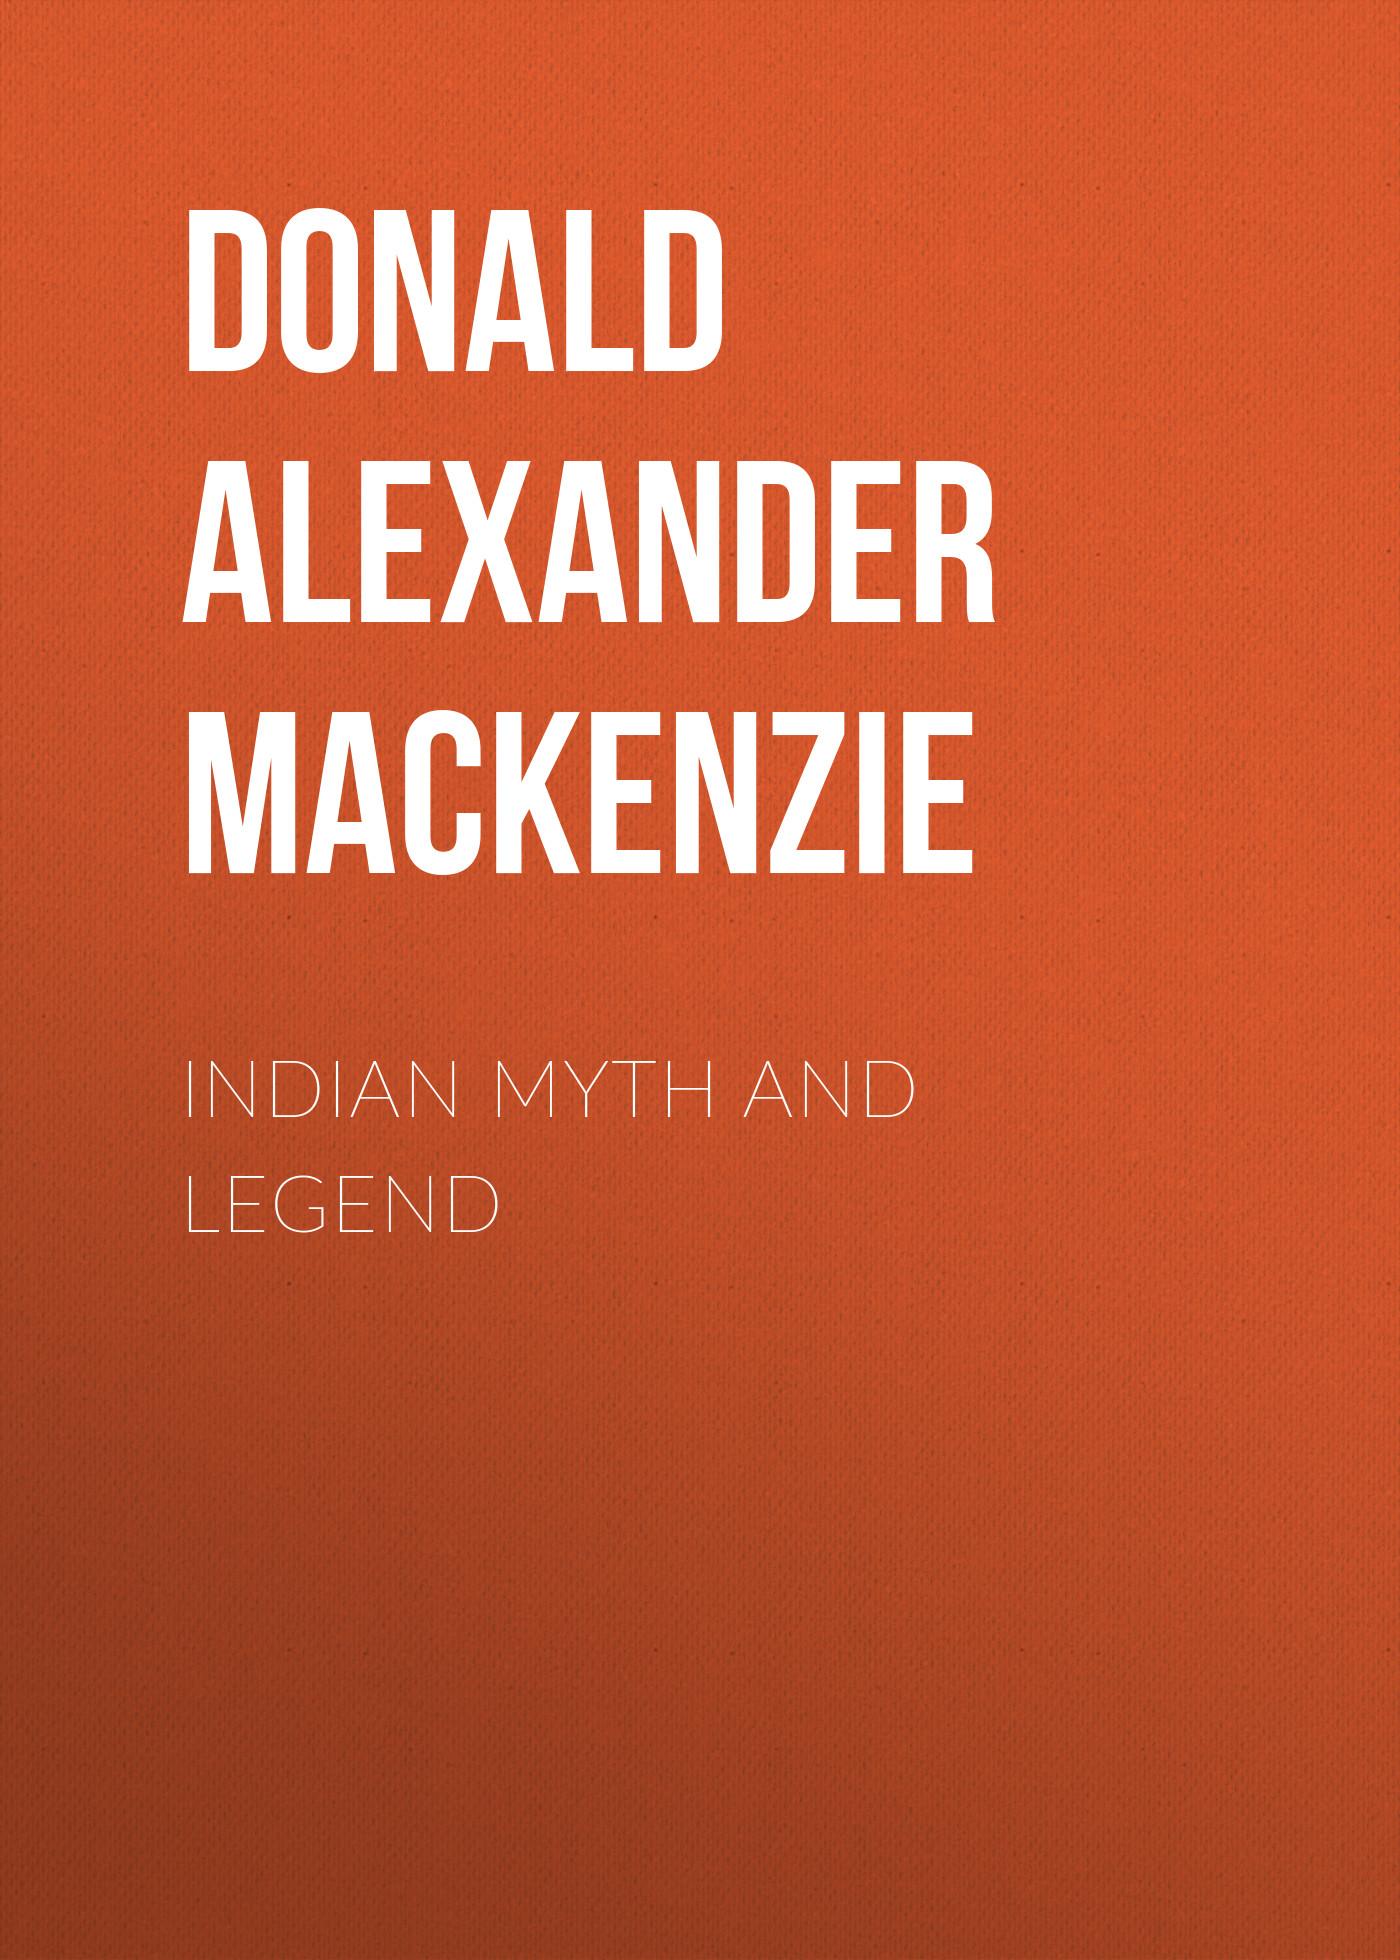 Donald Alexander Mackenzie Indian Myth and Legend donald alexander mackenzie indian myth and legend